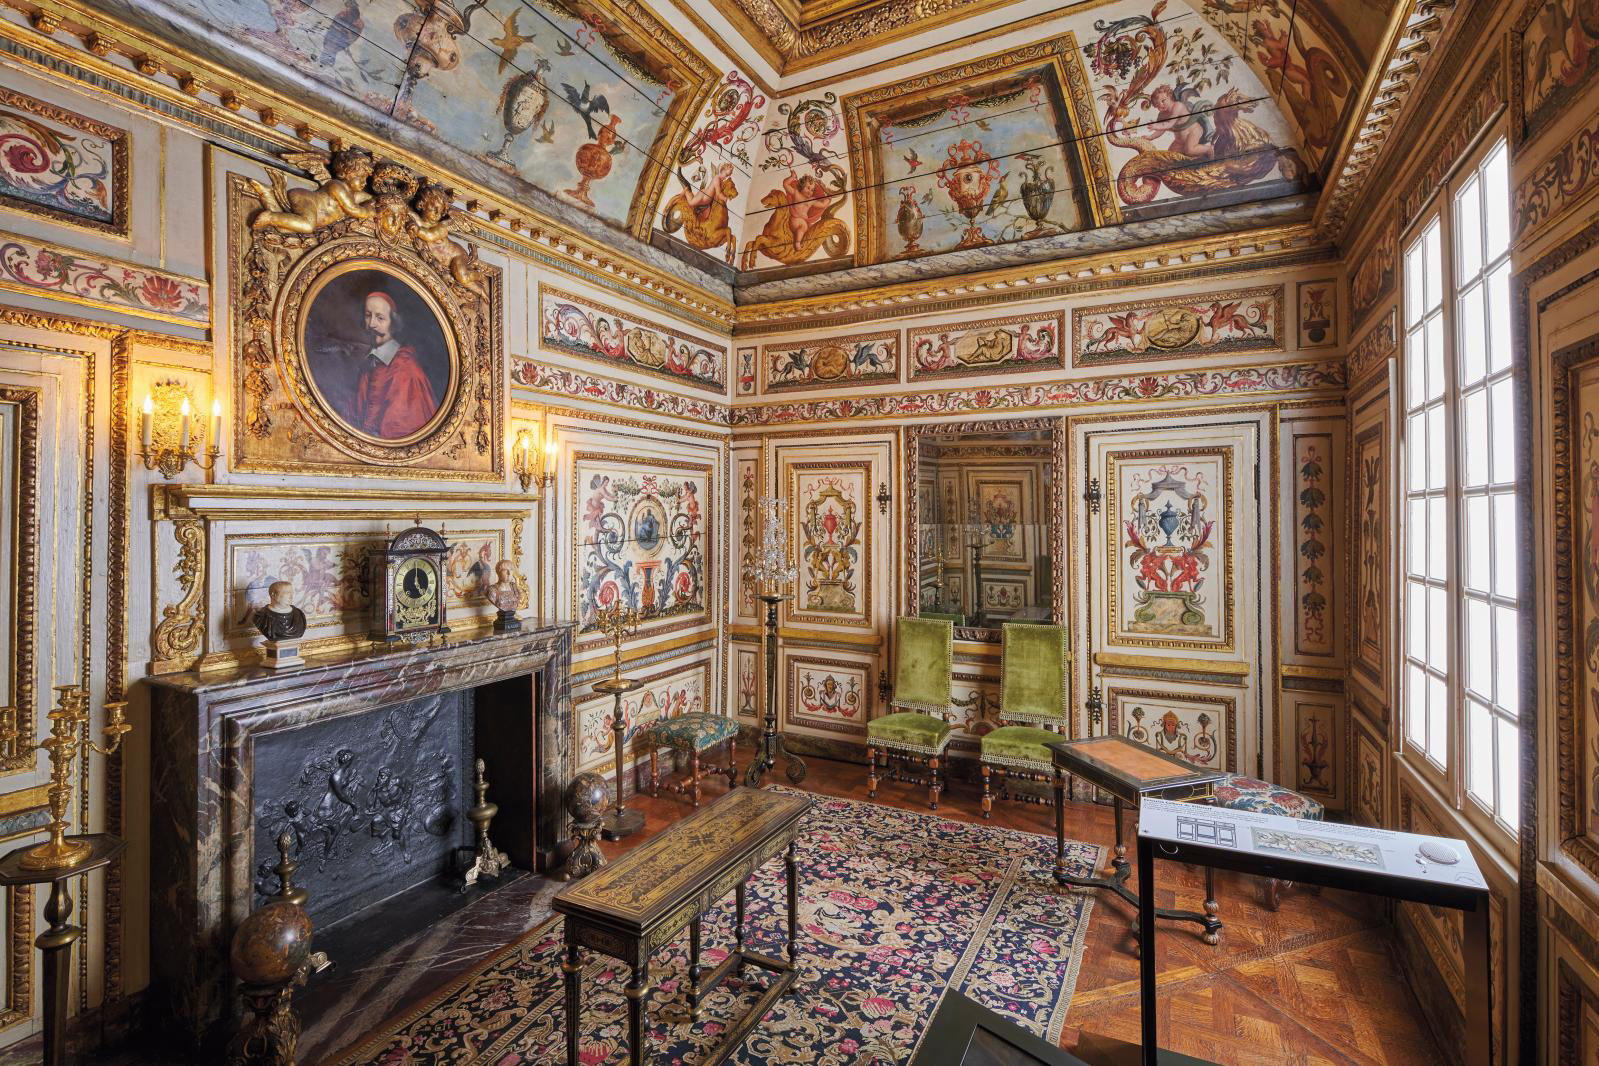 The wood paneling of the study in the Hôtel Colbert de Villacerf, acquired by the City of Paris in 1867. Musée Carnavalet - Histoire de Paris © Pierre Antoine